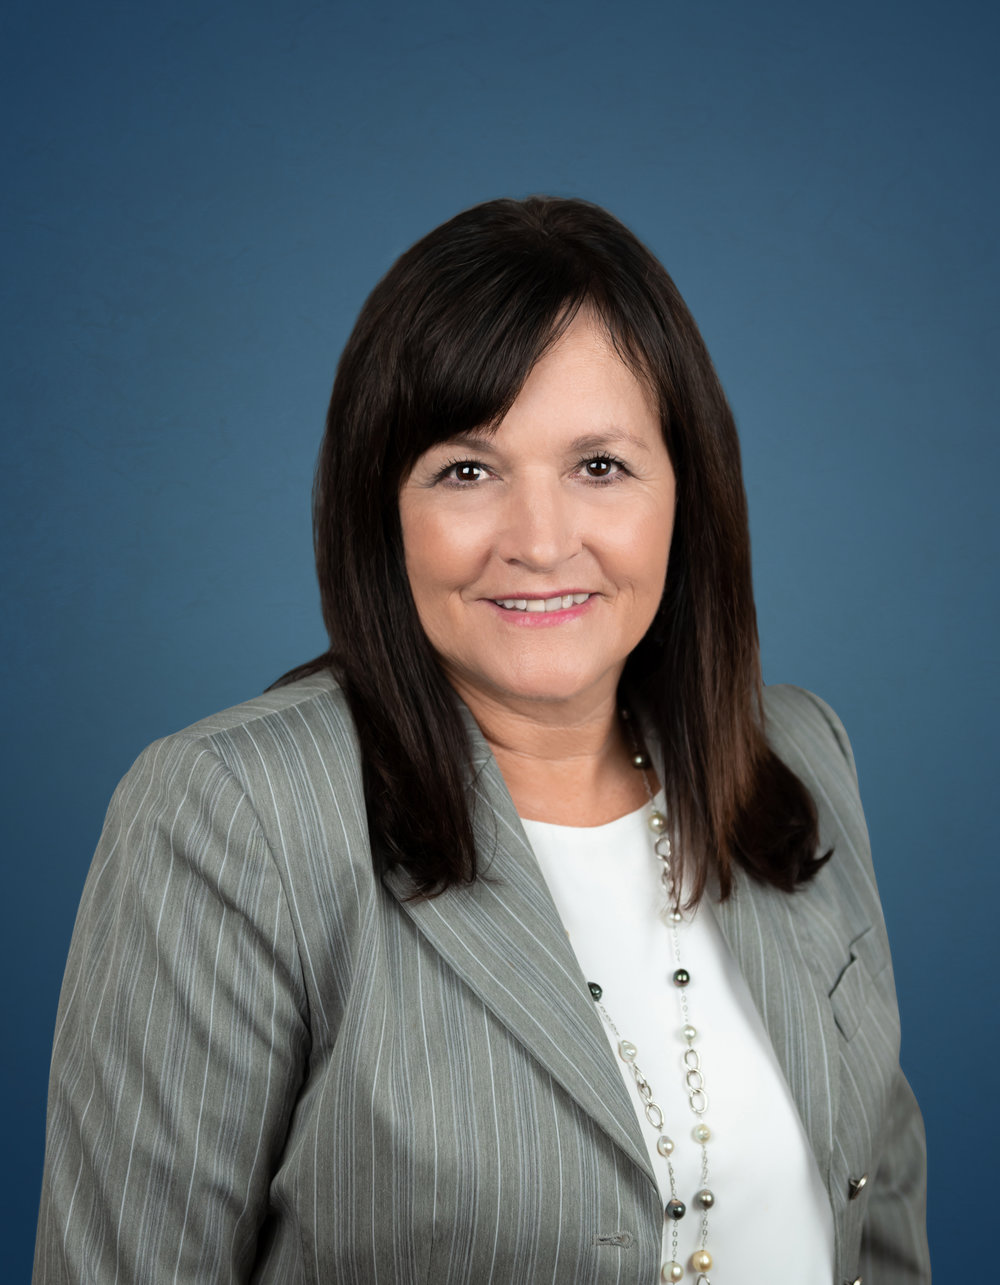 Julie Lange Controller of Berg Pipe Group